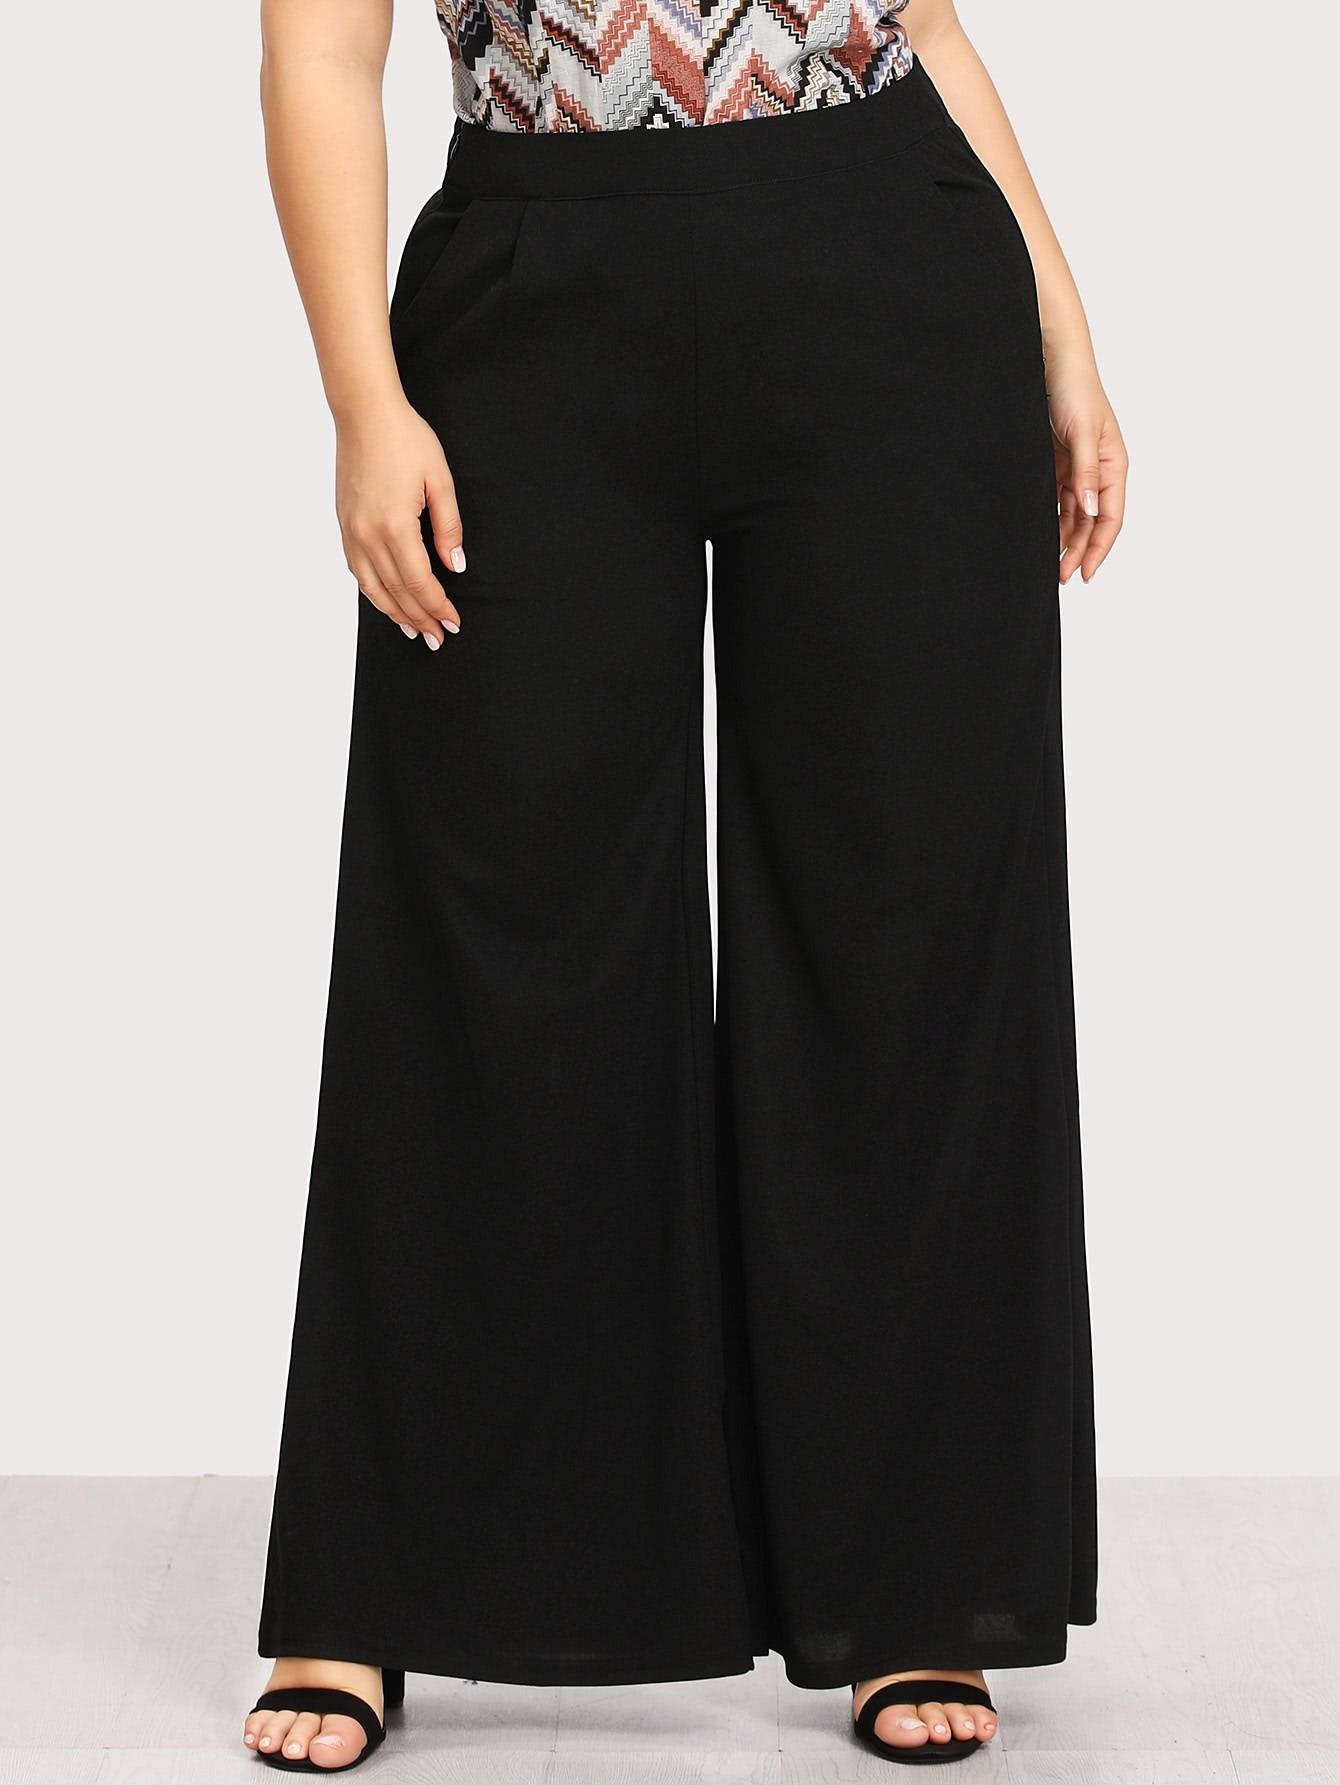 Image of Wide Leg Pants